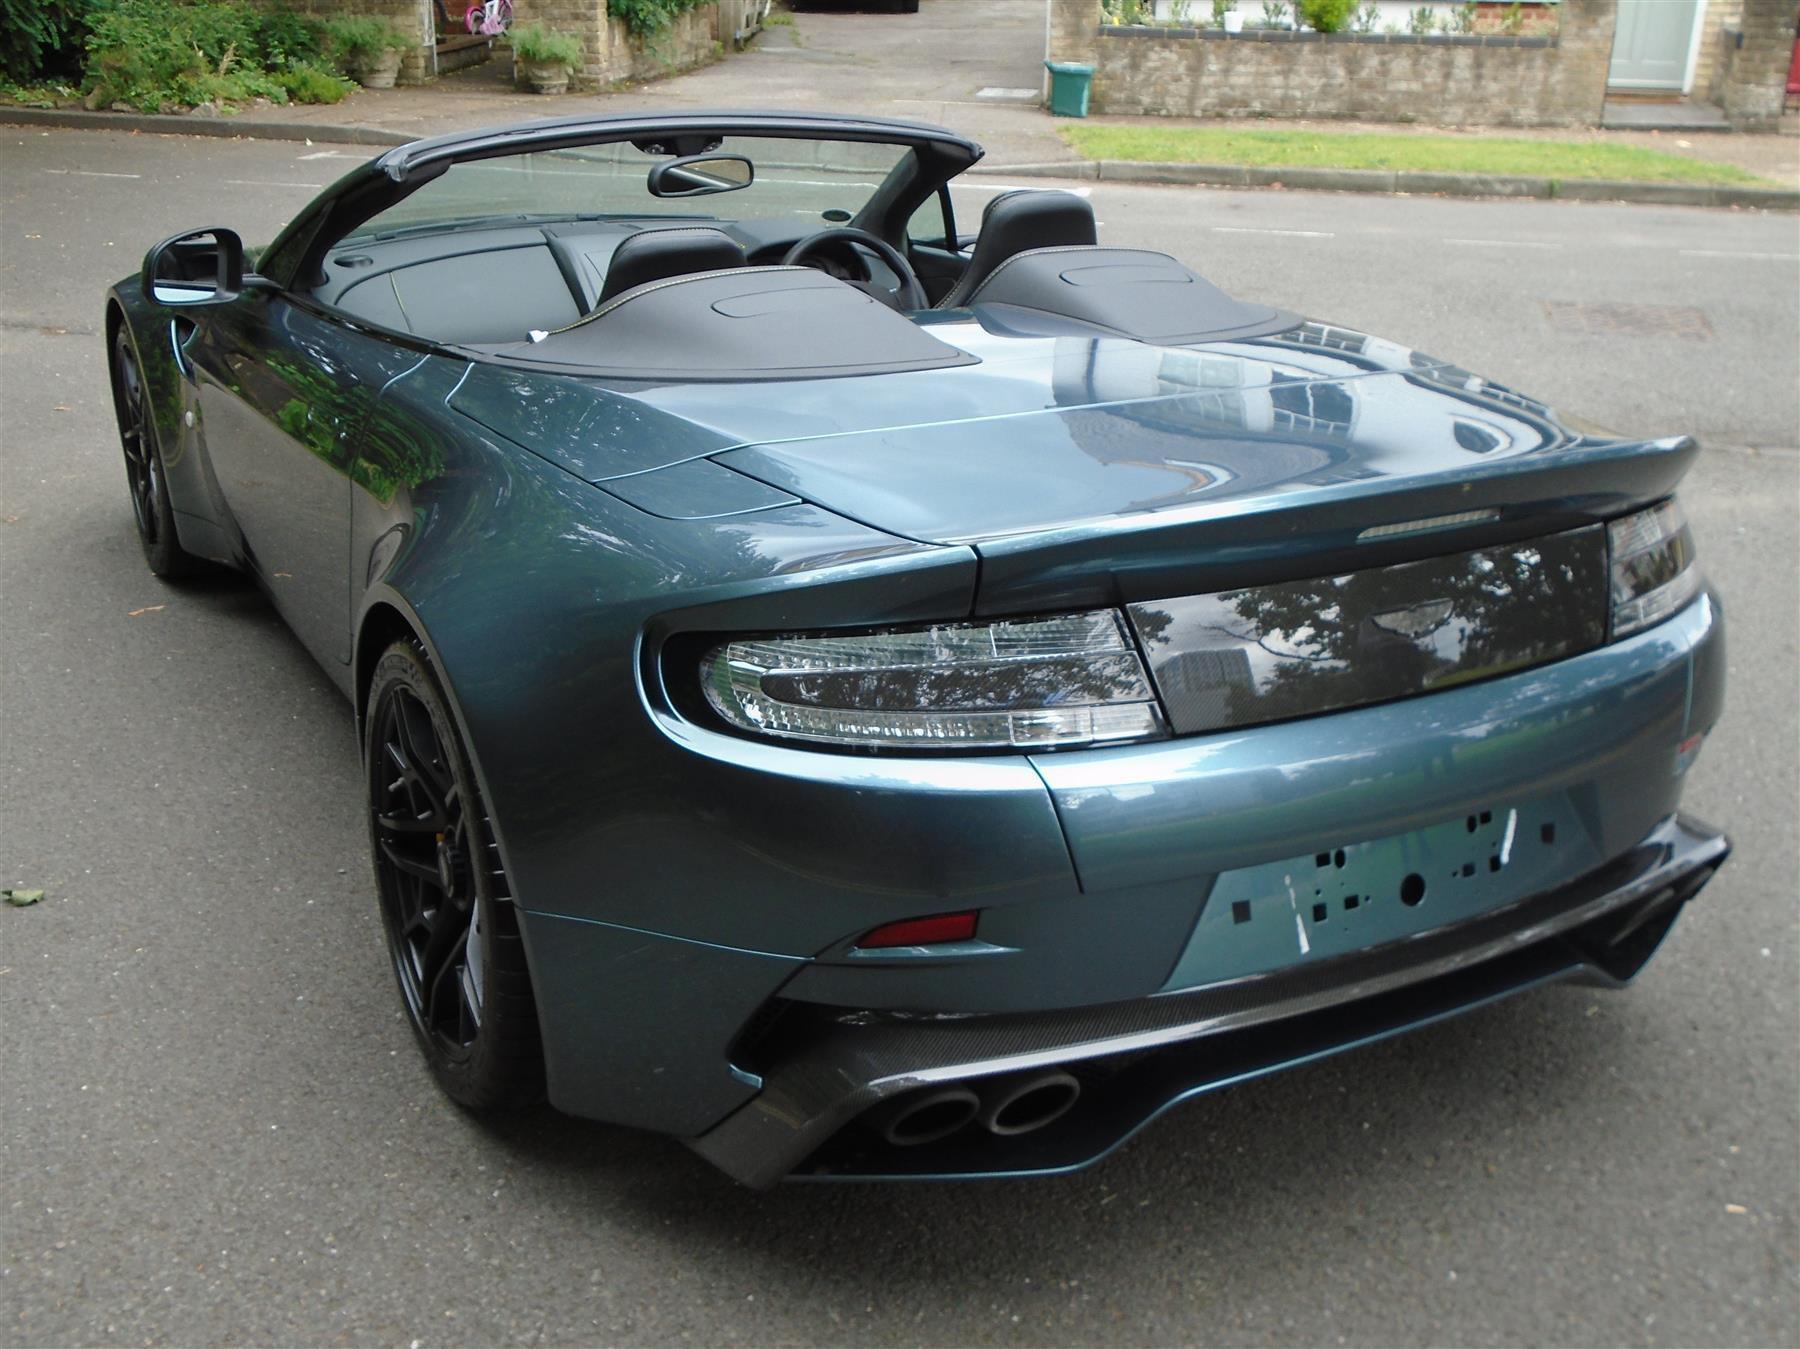 Aston_Martin_V12_Vantage_V600_Roadster_sale-0004